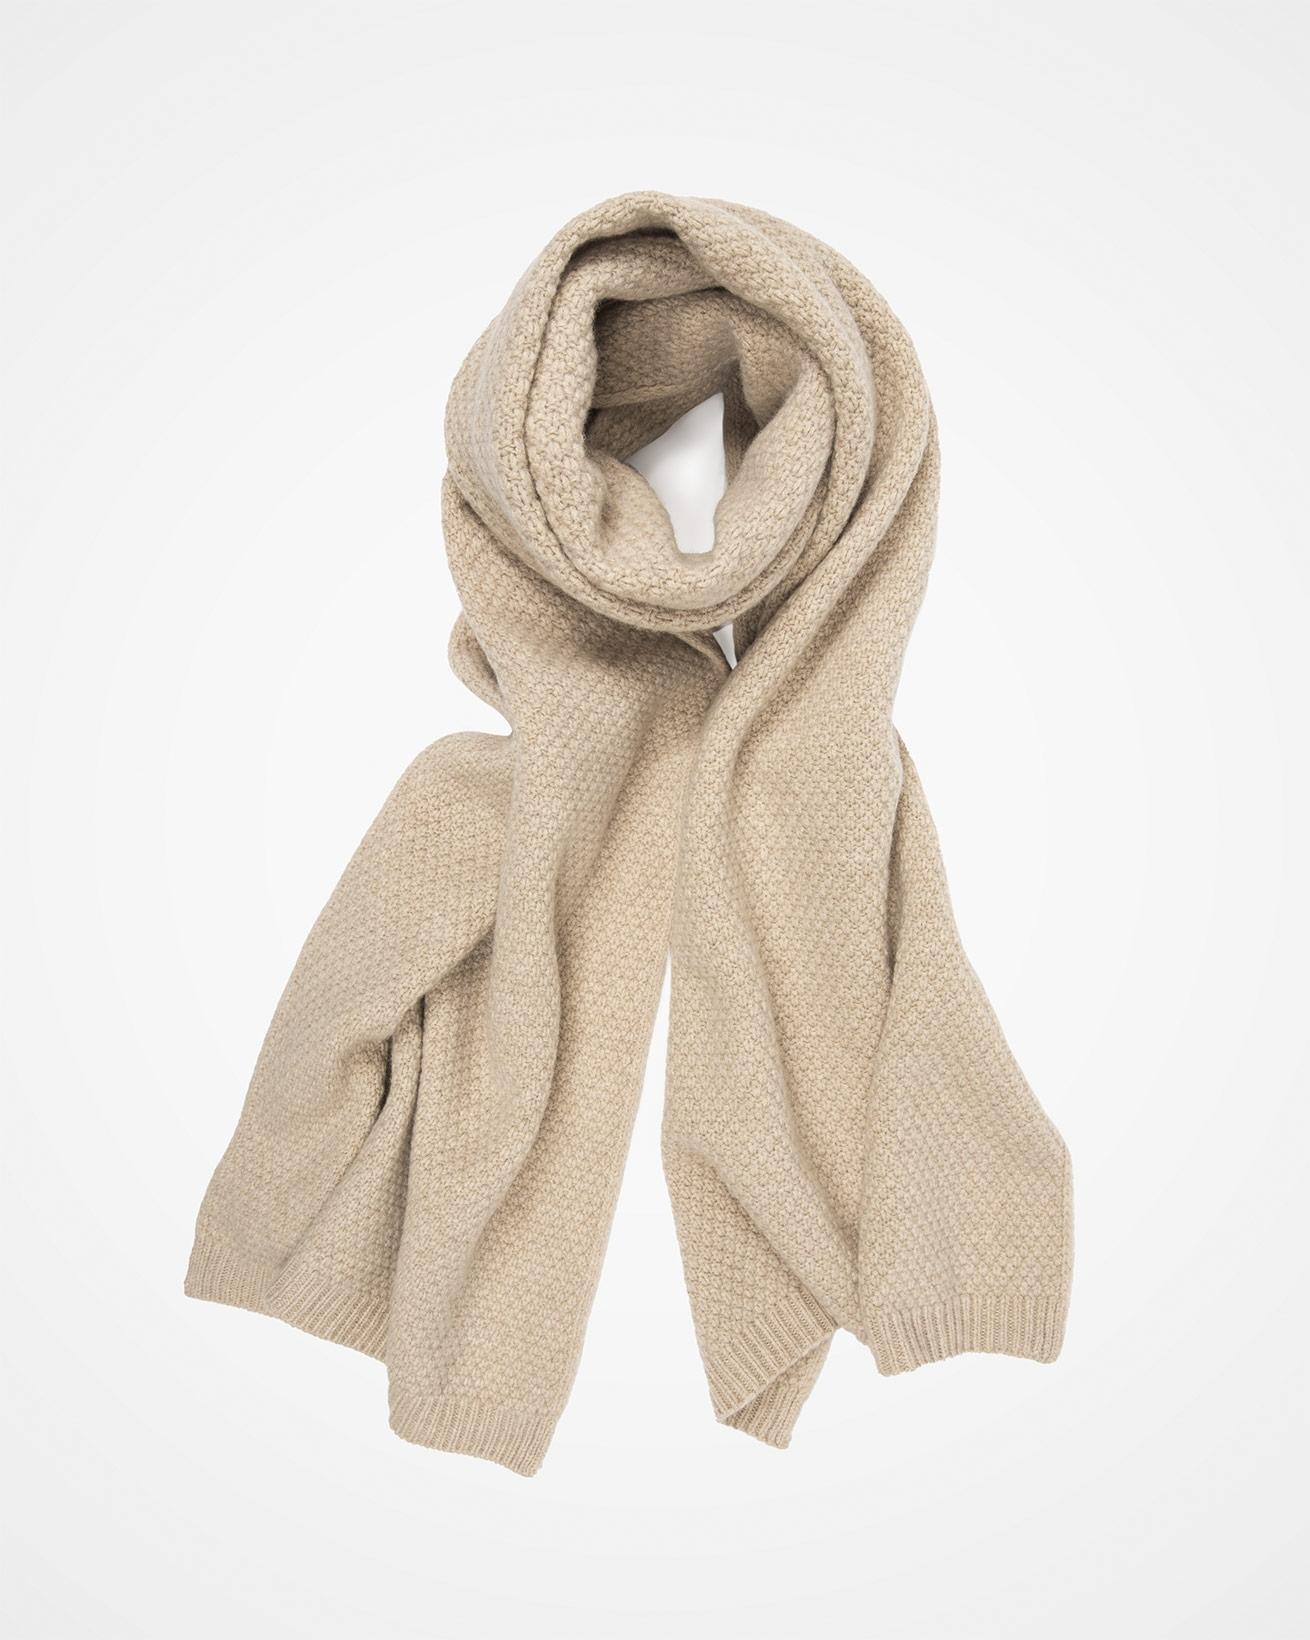 7758_lambswool-moss-stitch-scarf_oatmeal_swirl.jpg